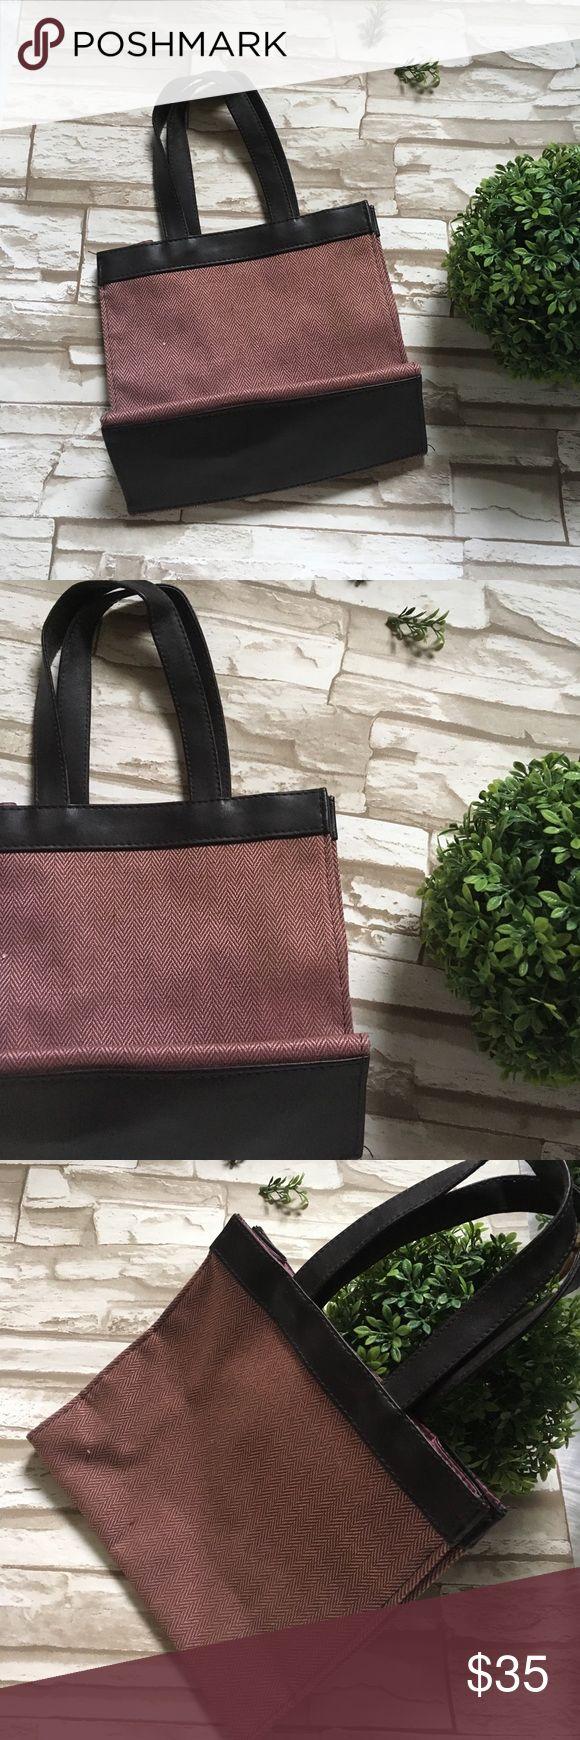 🆑SALE, Estée Lauder Mini Bag Condition: Excellent Used Condition, Made In China 🇨🇳, Bundle 3+ & Get 10% Off! Thx, Happy Poshing Estee Lauder Bags Mini Bags